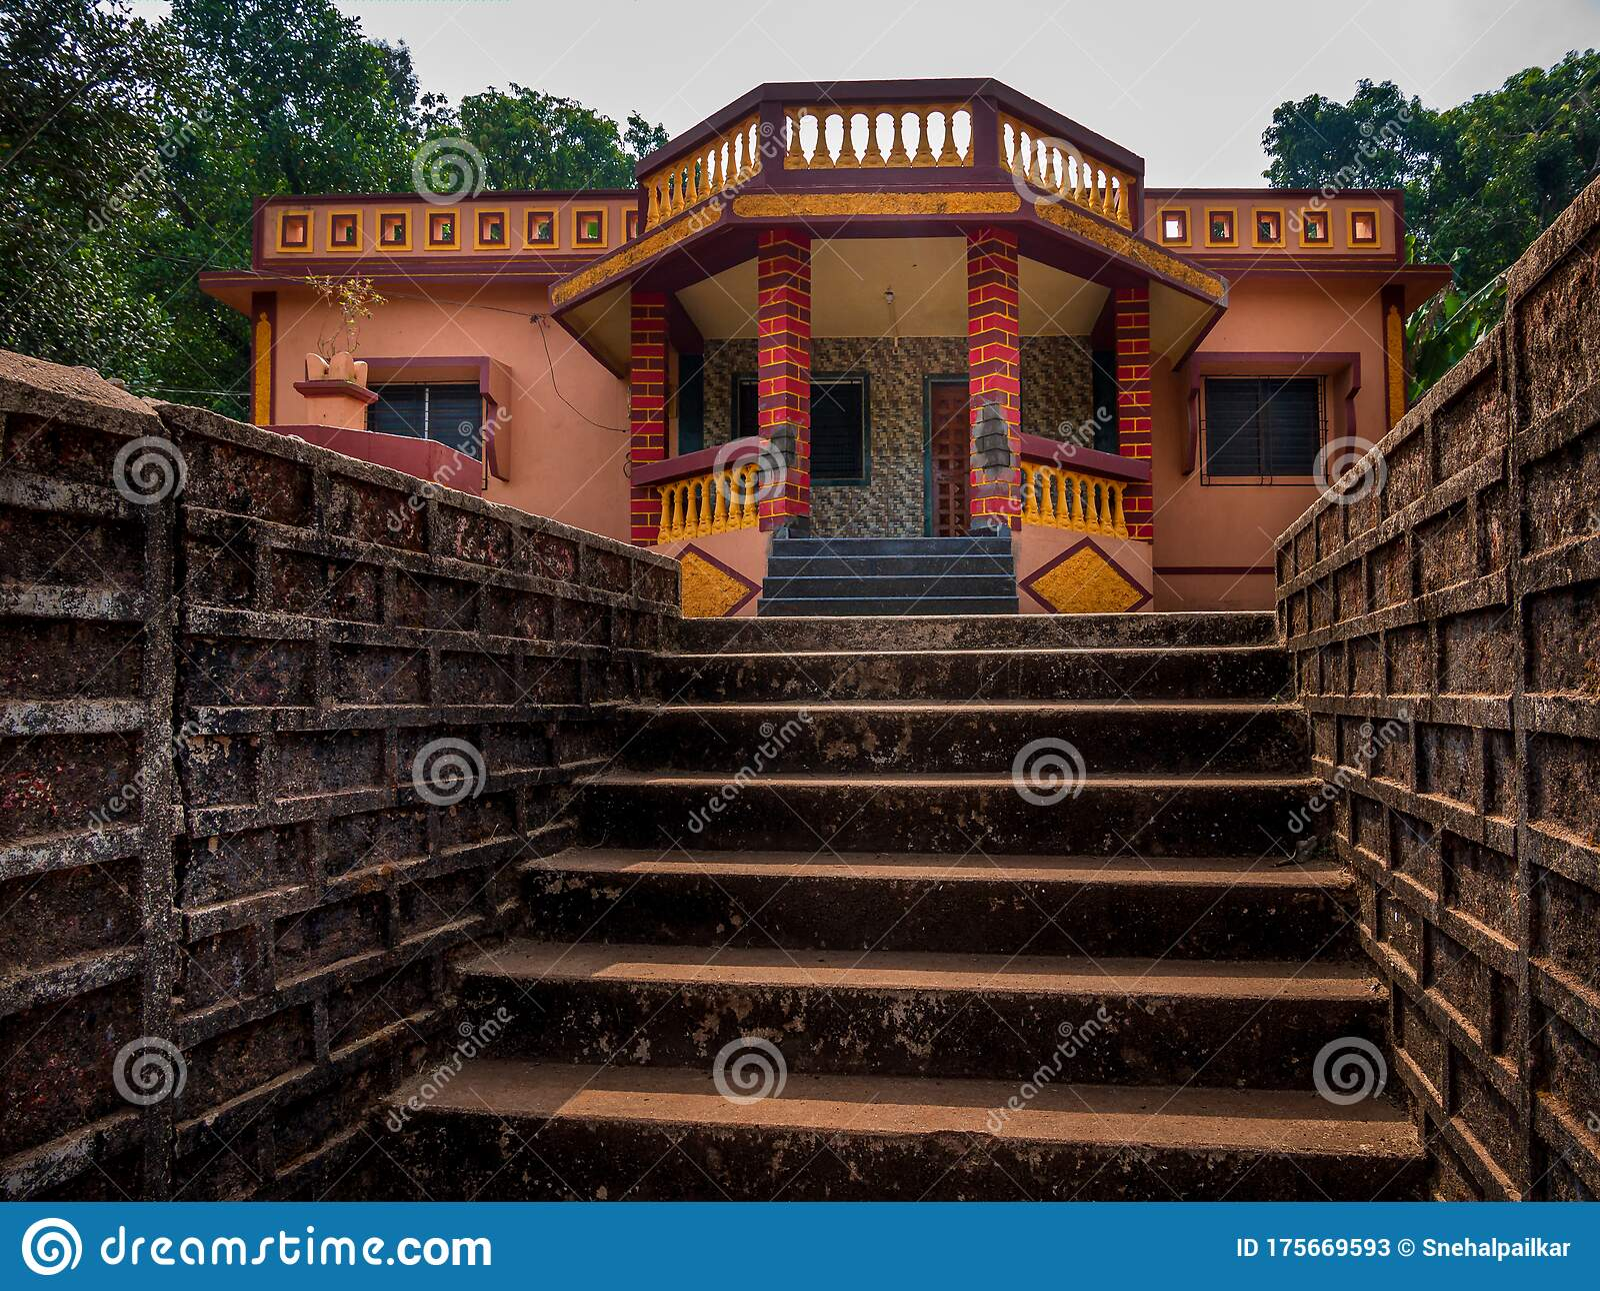 Indian House With Traditional Roof Design At Coastal Side Of Maharashtra Stock Image Image Of House Travel 175669593